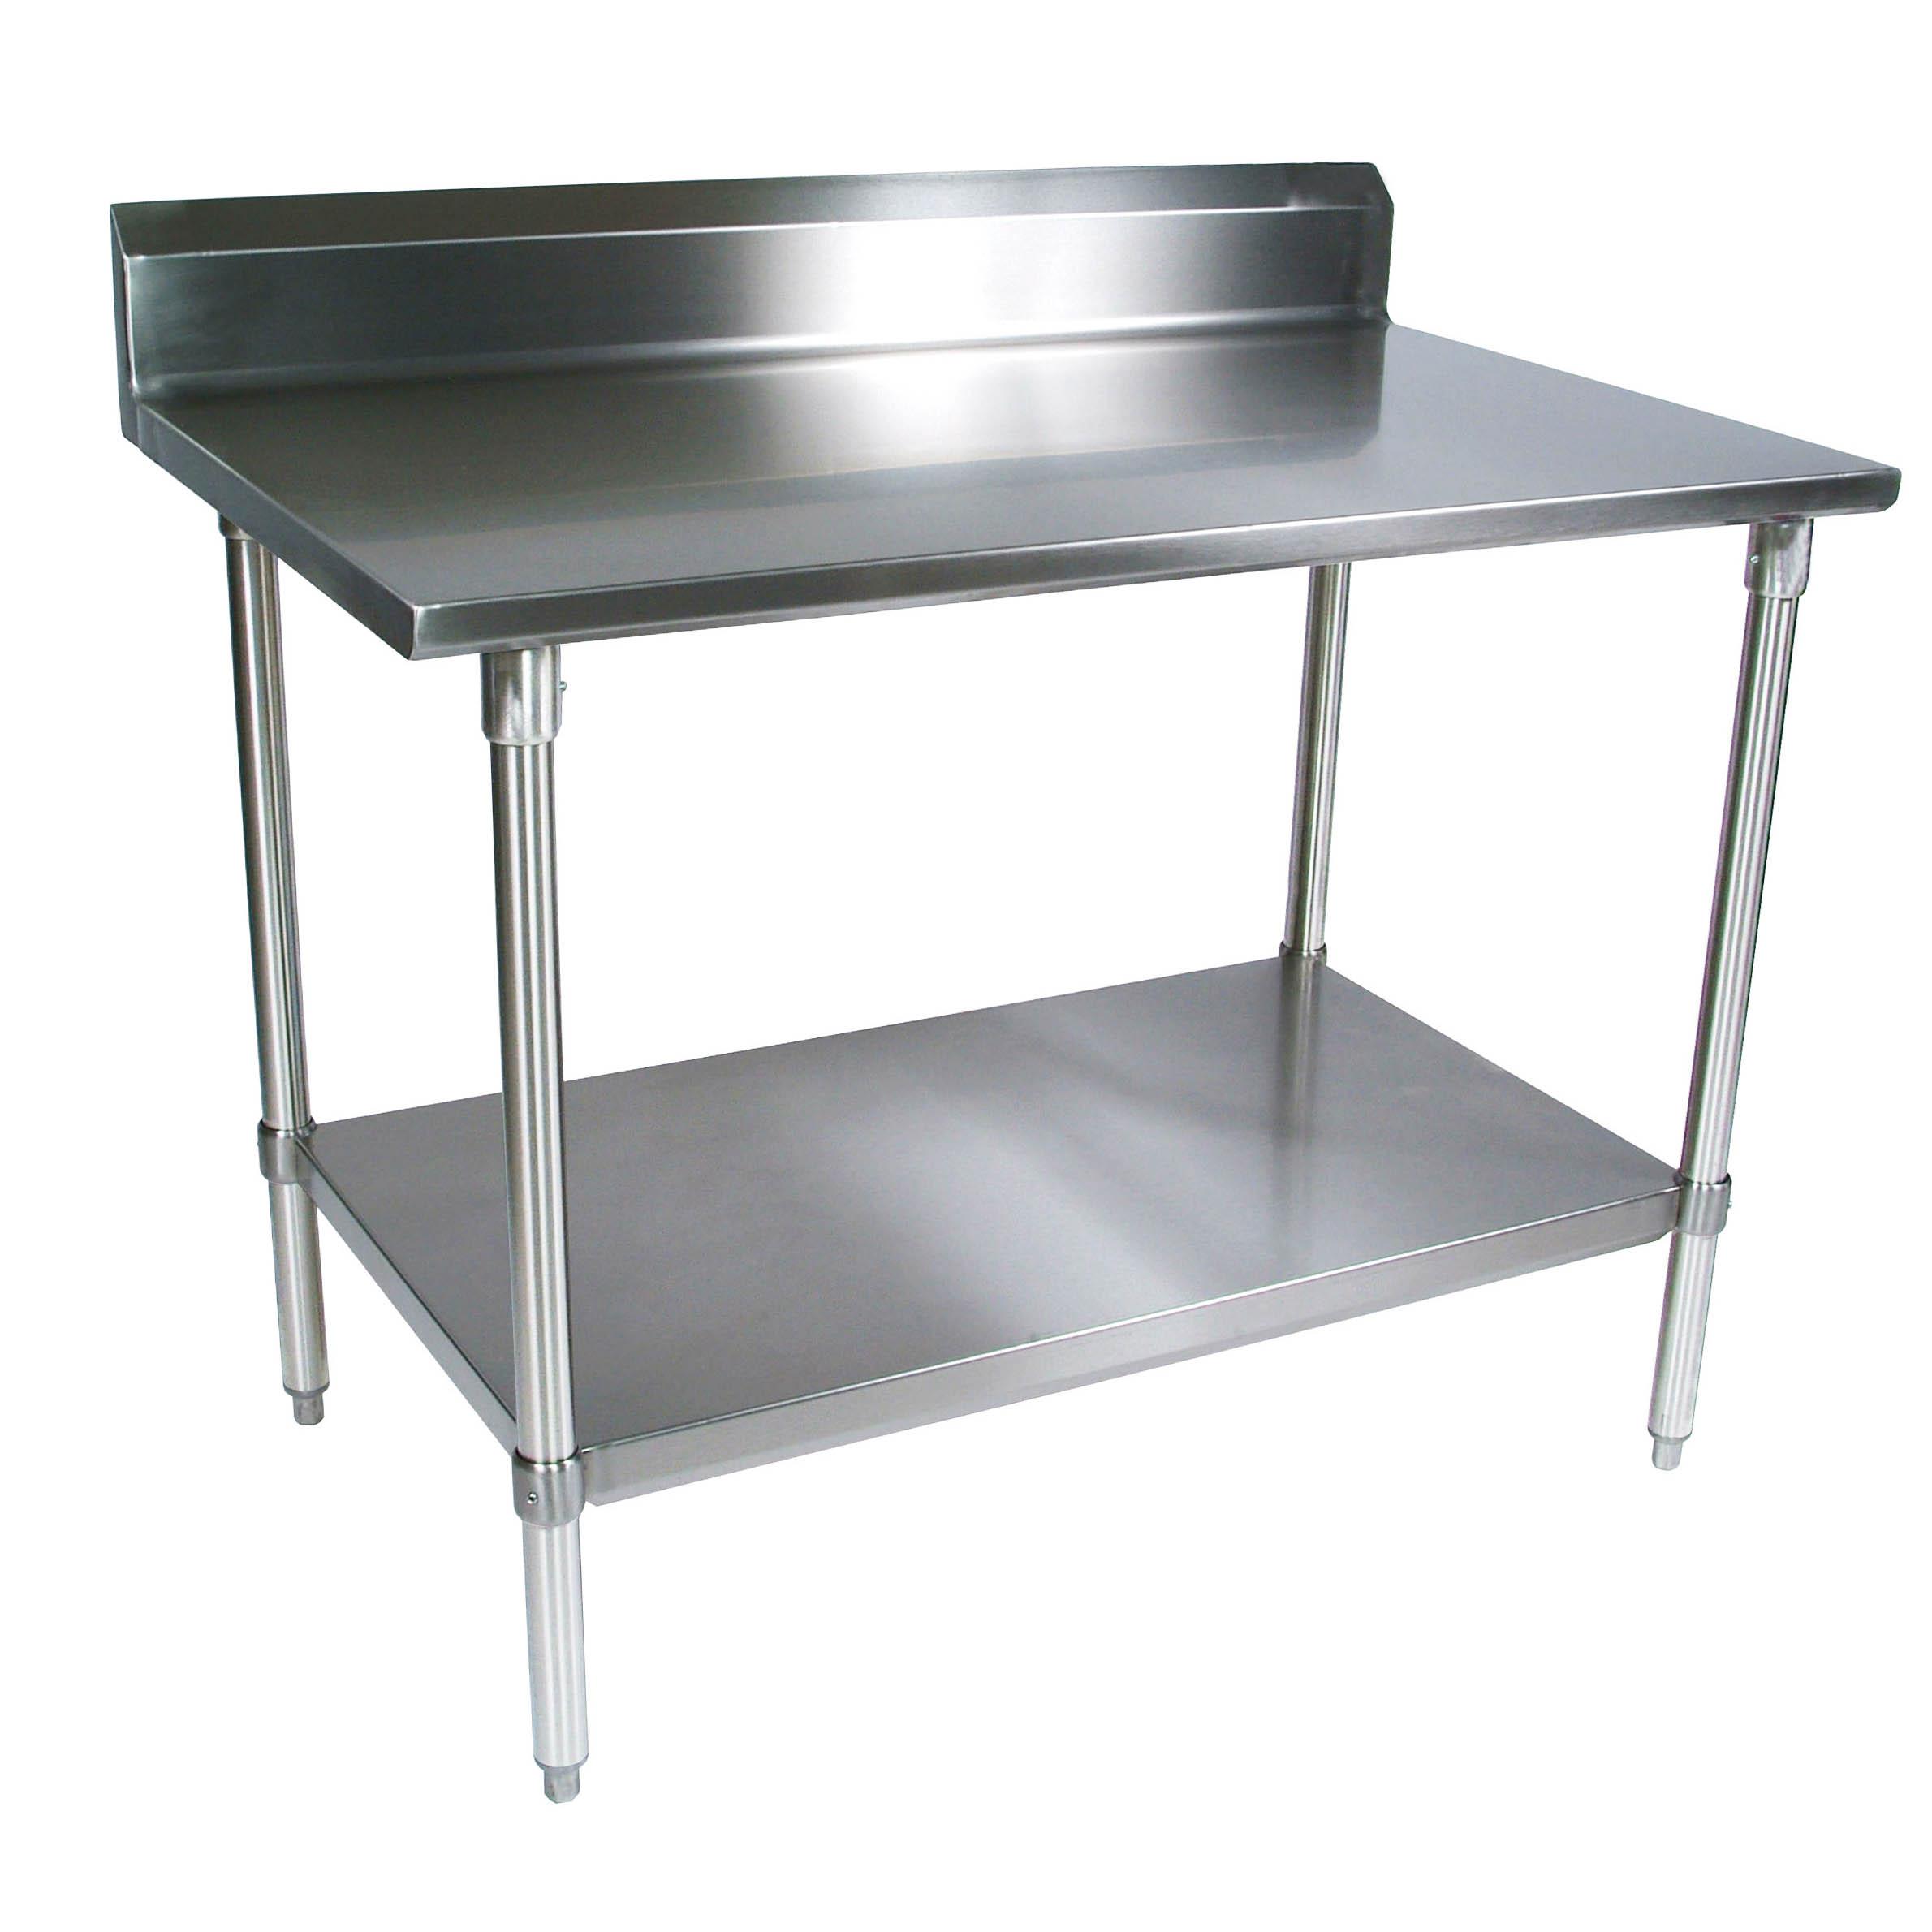 BK Resources CTTR5-3630 work table,  36